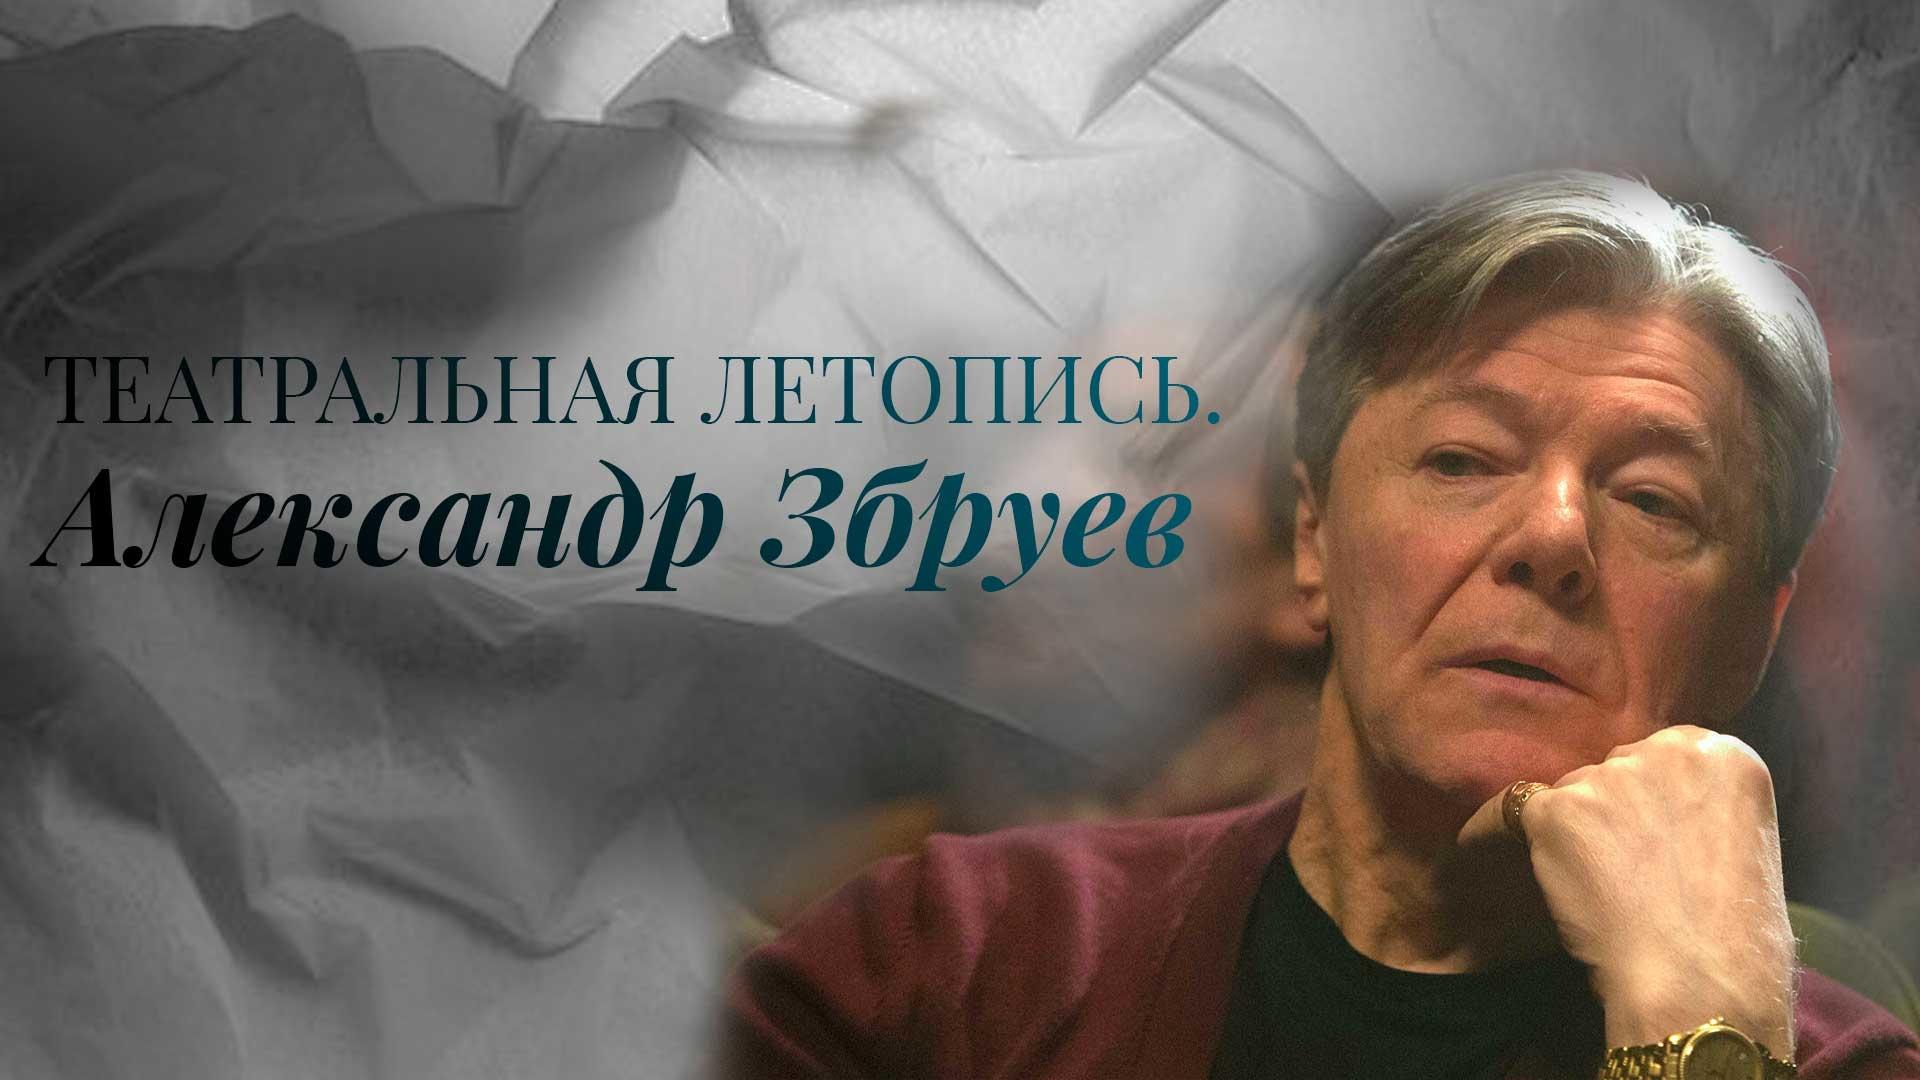 Театральная летопись. Александр Збруев